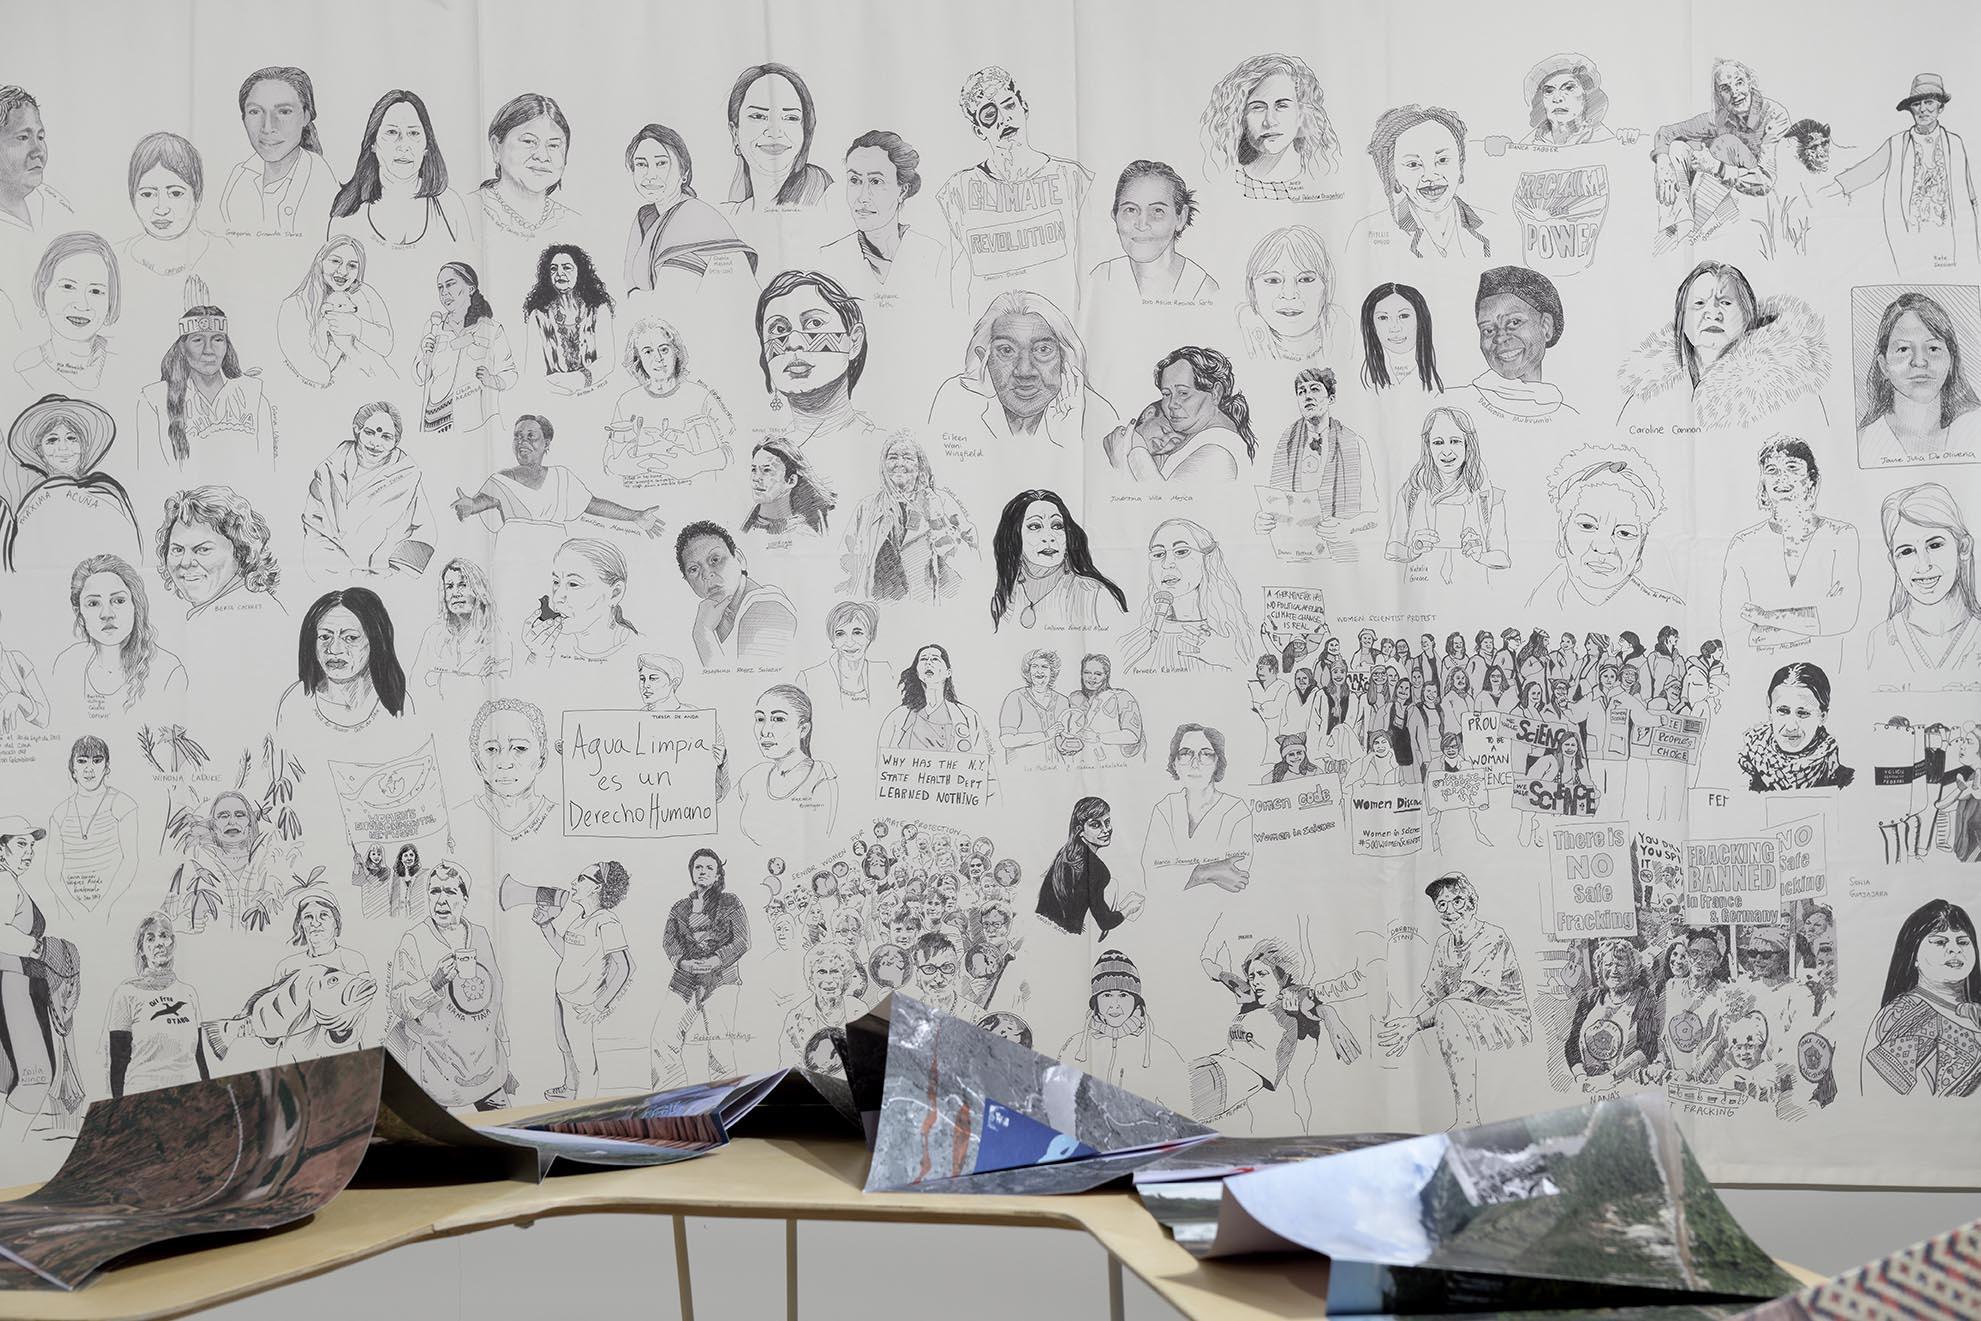 Carolina Caycedo 'My Feminine Lineage of Environmental Struggle' (2018)